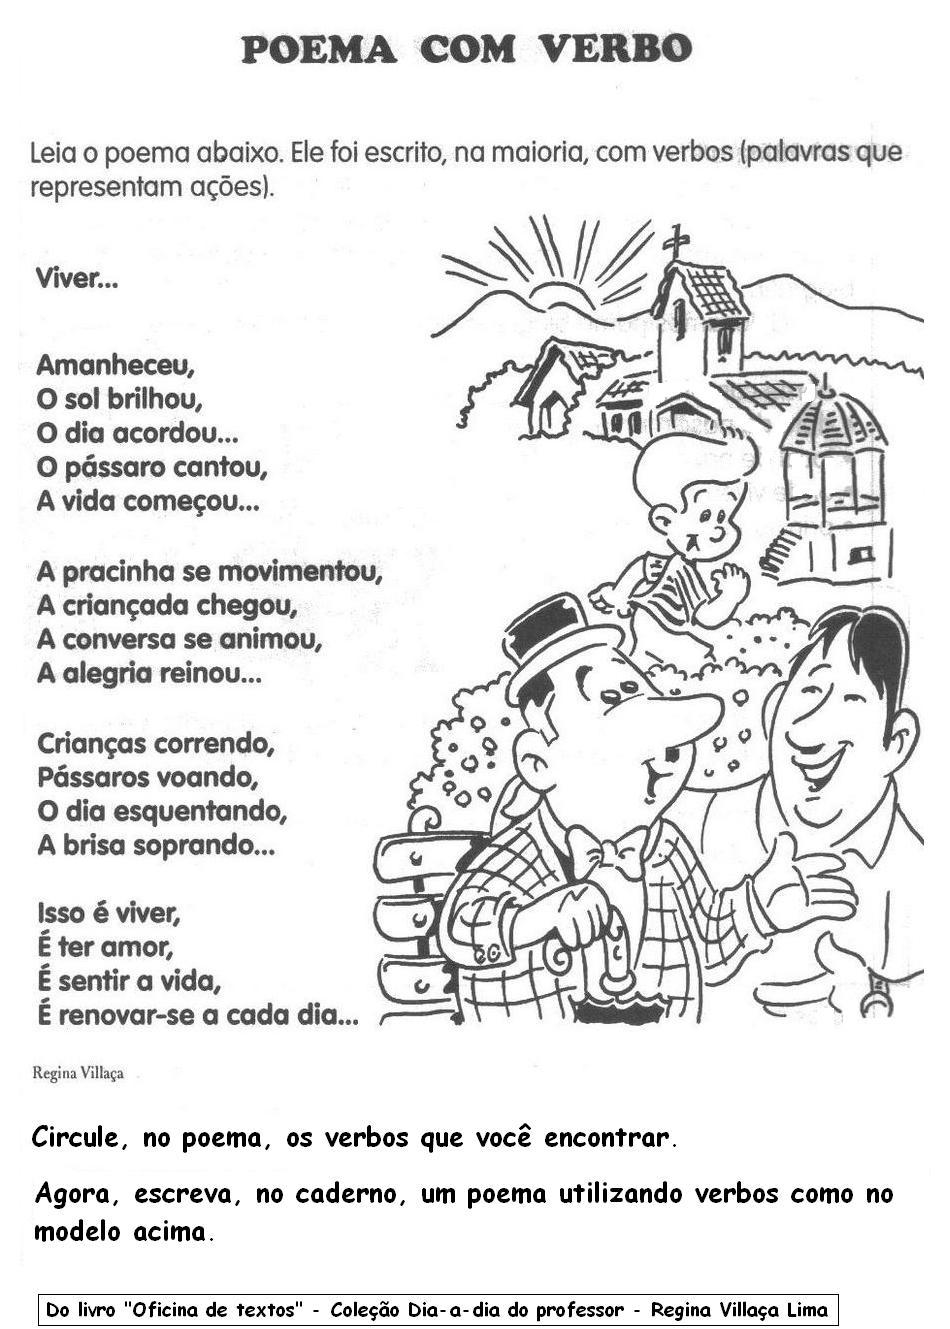 Postado Por Vanessa E Leandro   S 11 37